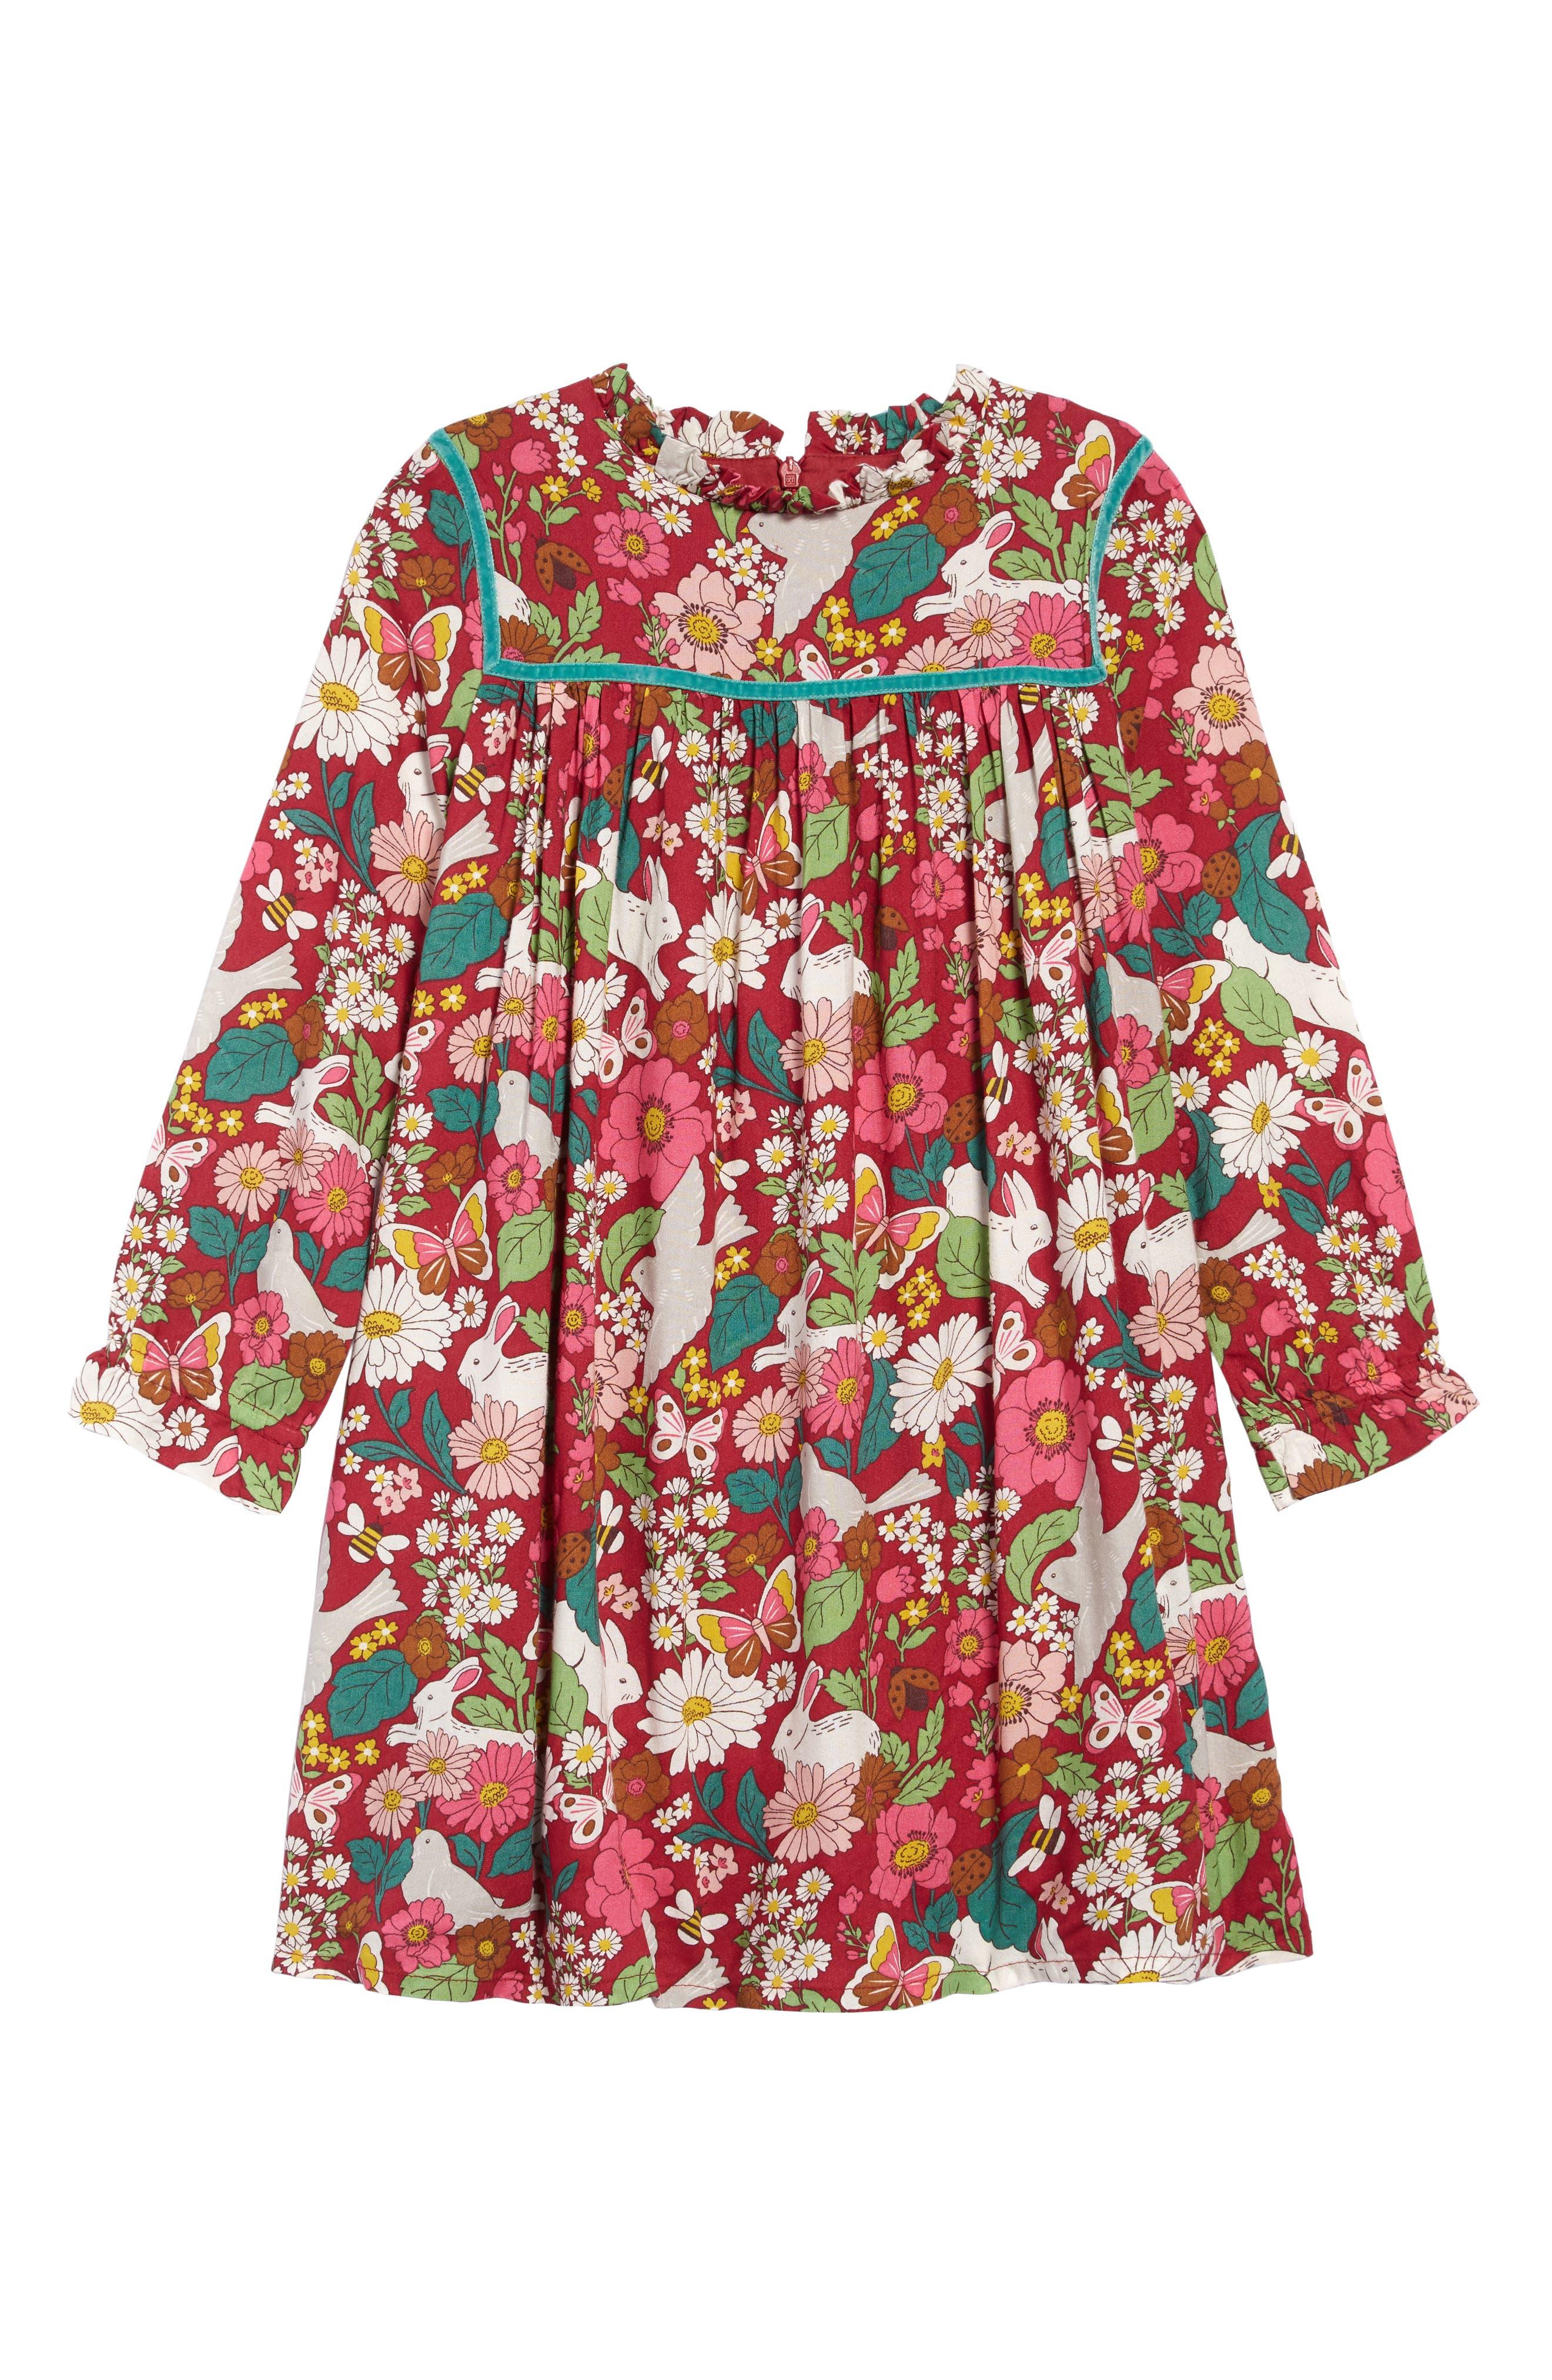 60s 70s Kids Costumes & Clothing Girls & Boys Toddler Girls Mini Boden Frill Neck Print Dress Size 3-4Y - Pink $45.00 AT vintagedancer.com